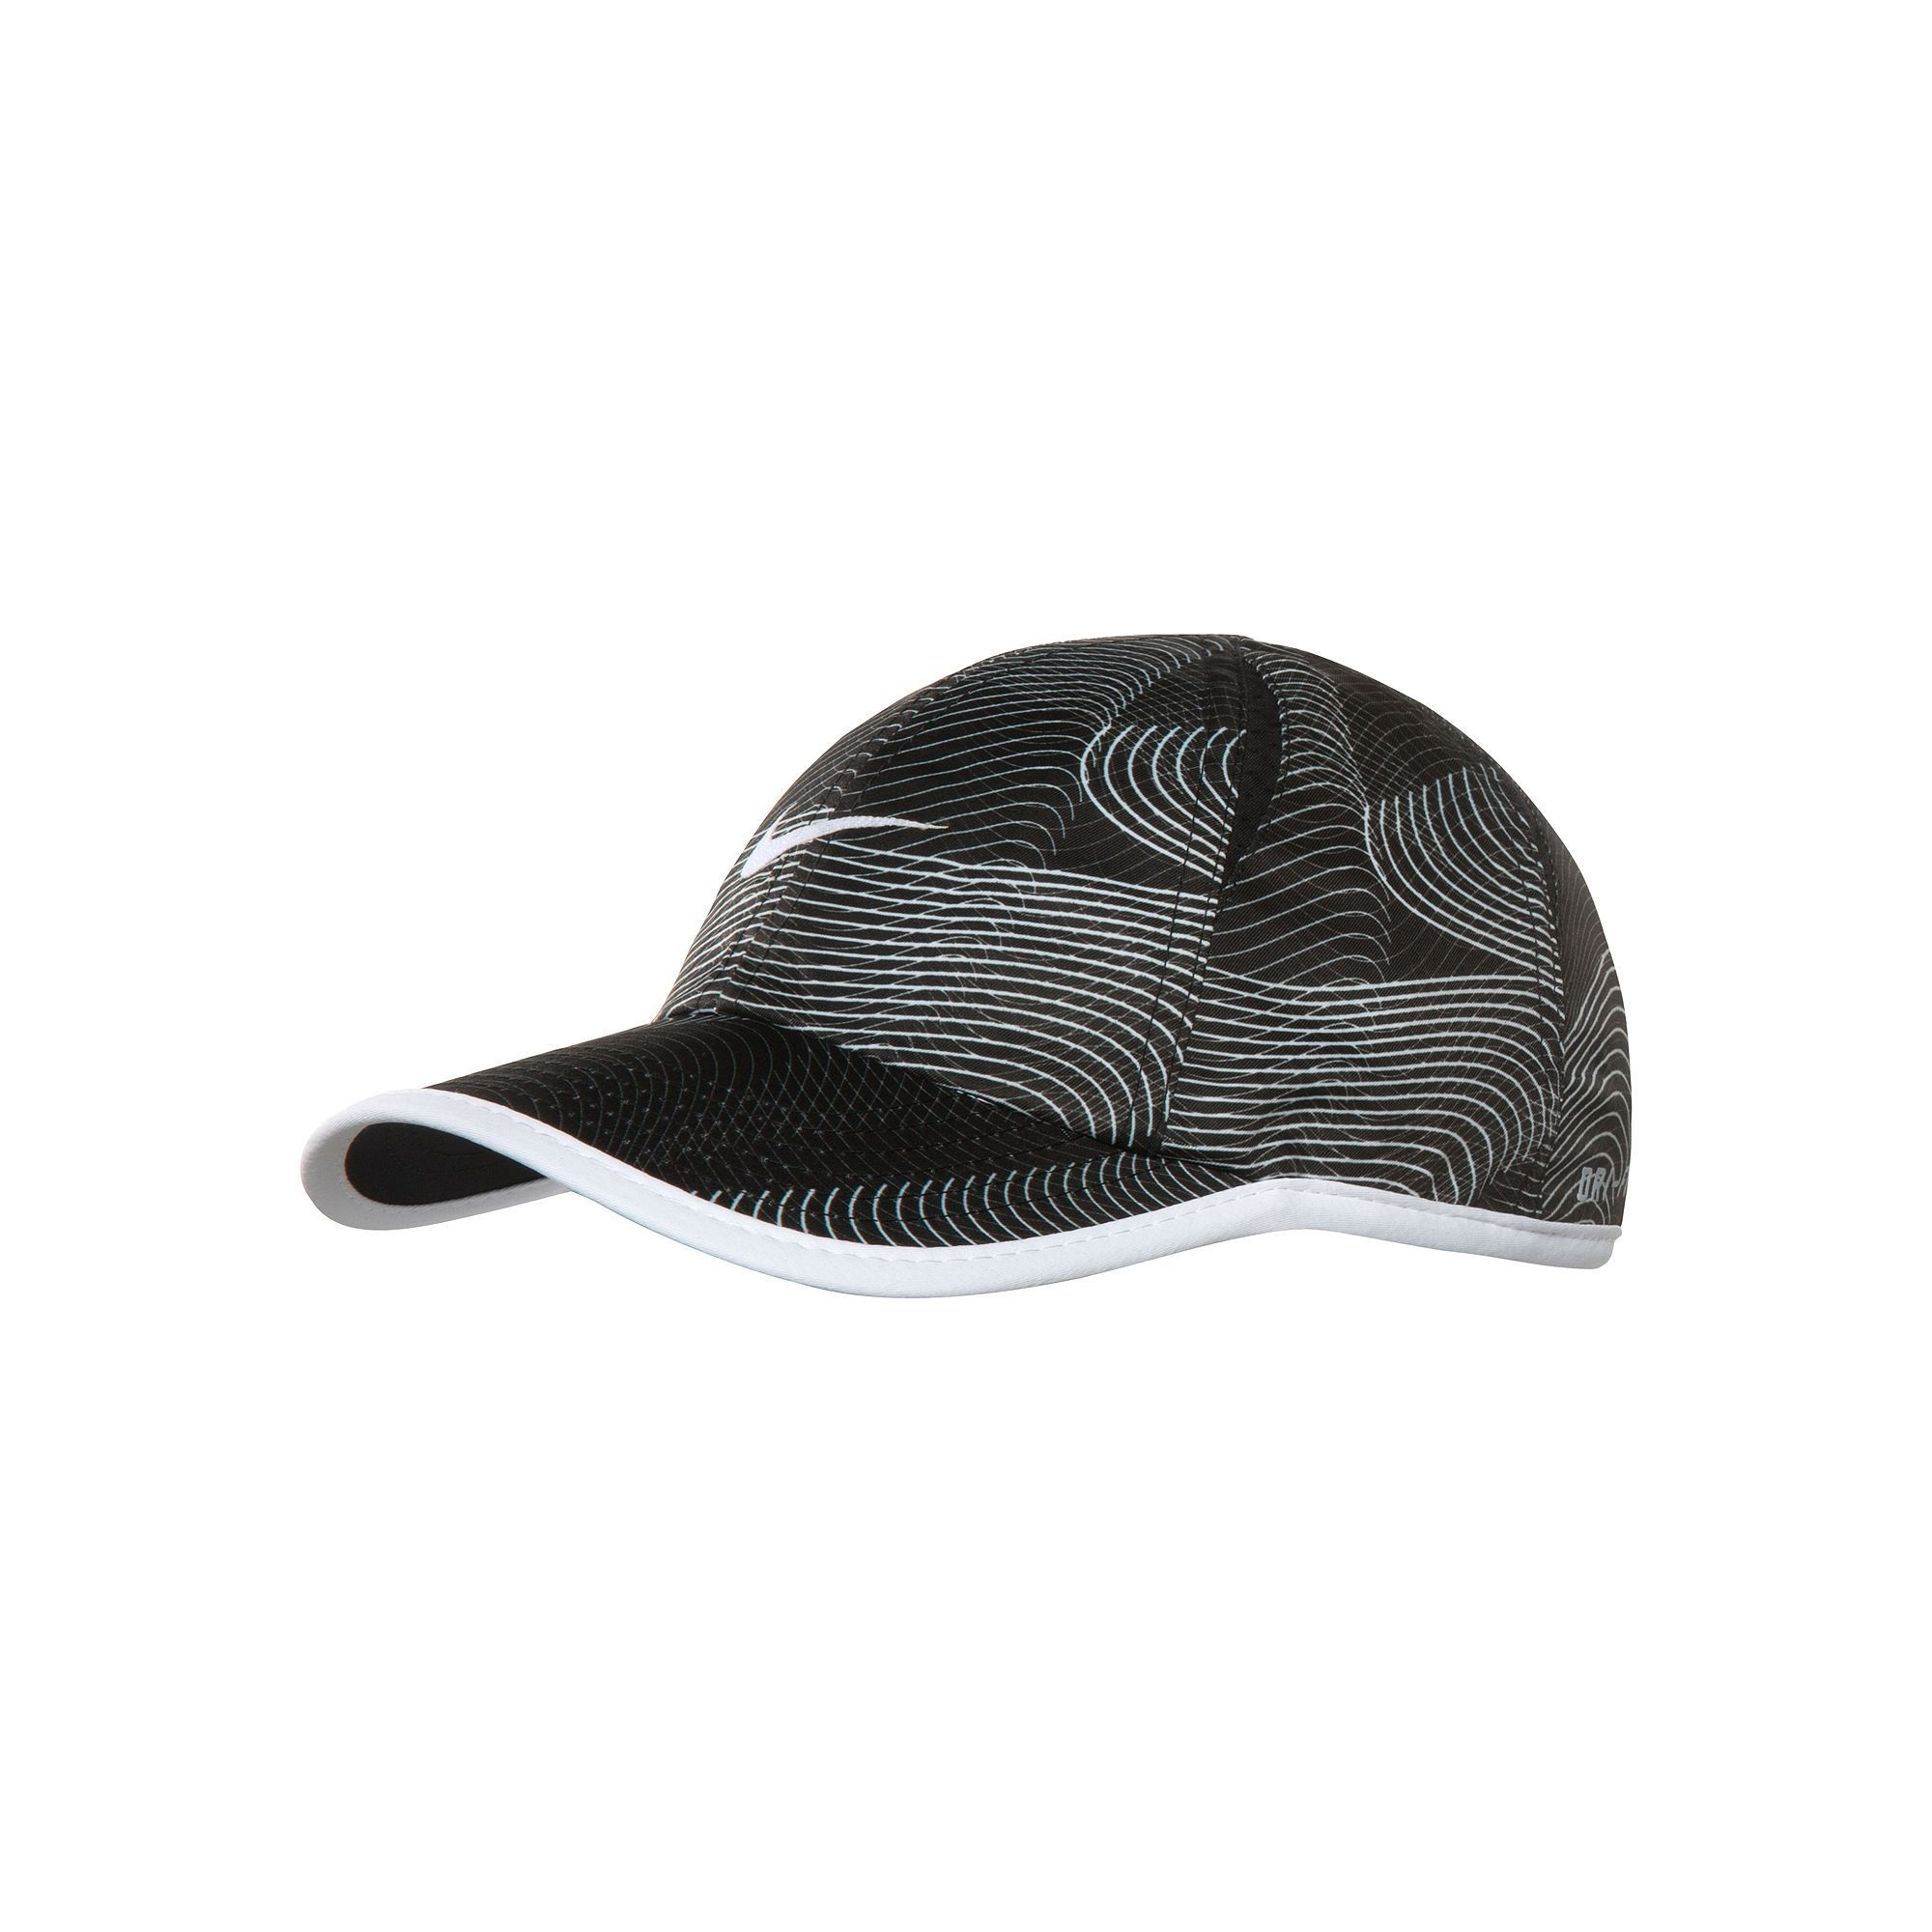 103cdb8034d Baby Boy Nike Dri-FIT Printed Feather Light Cap